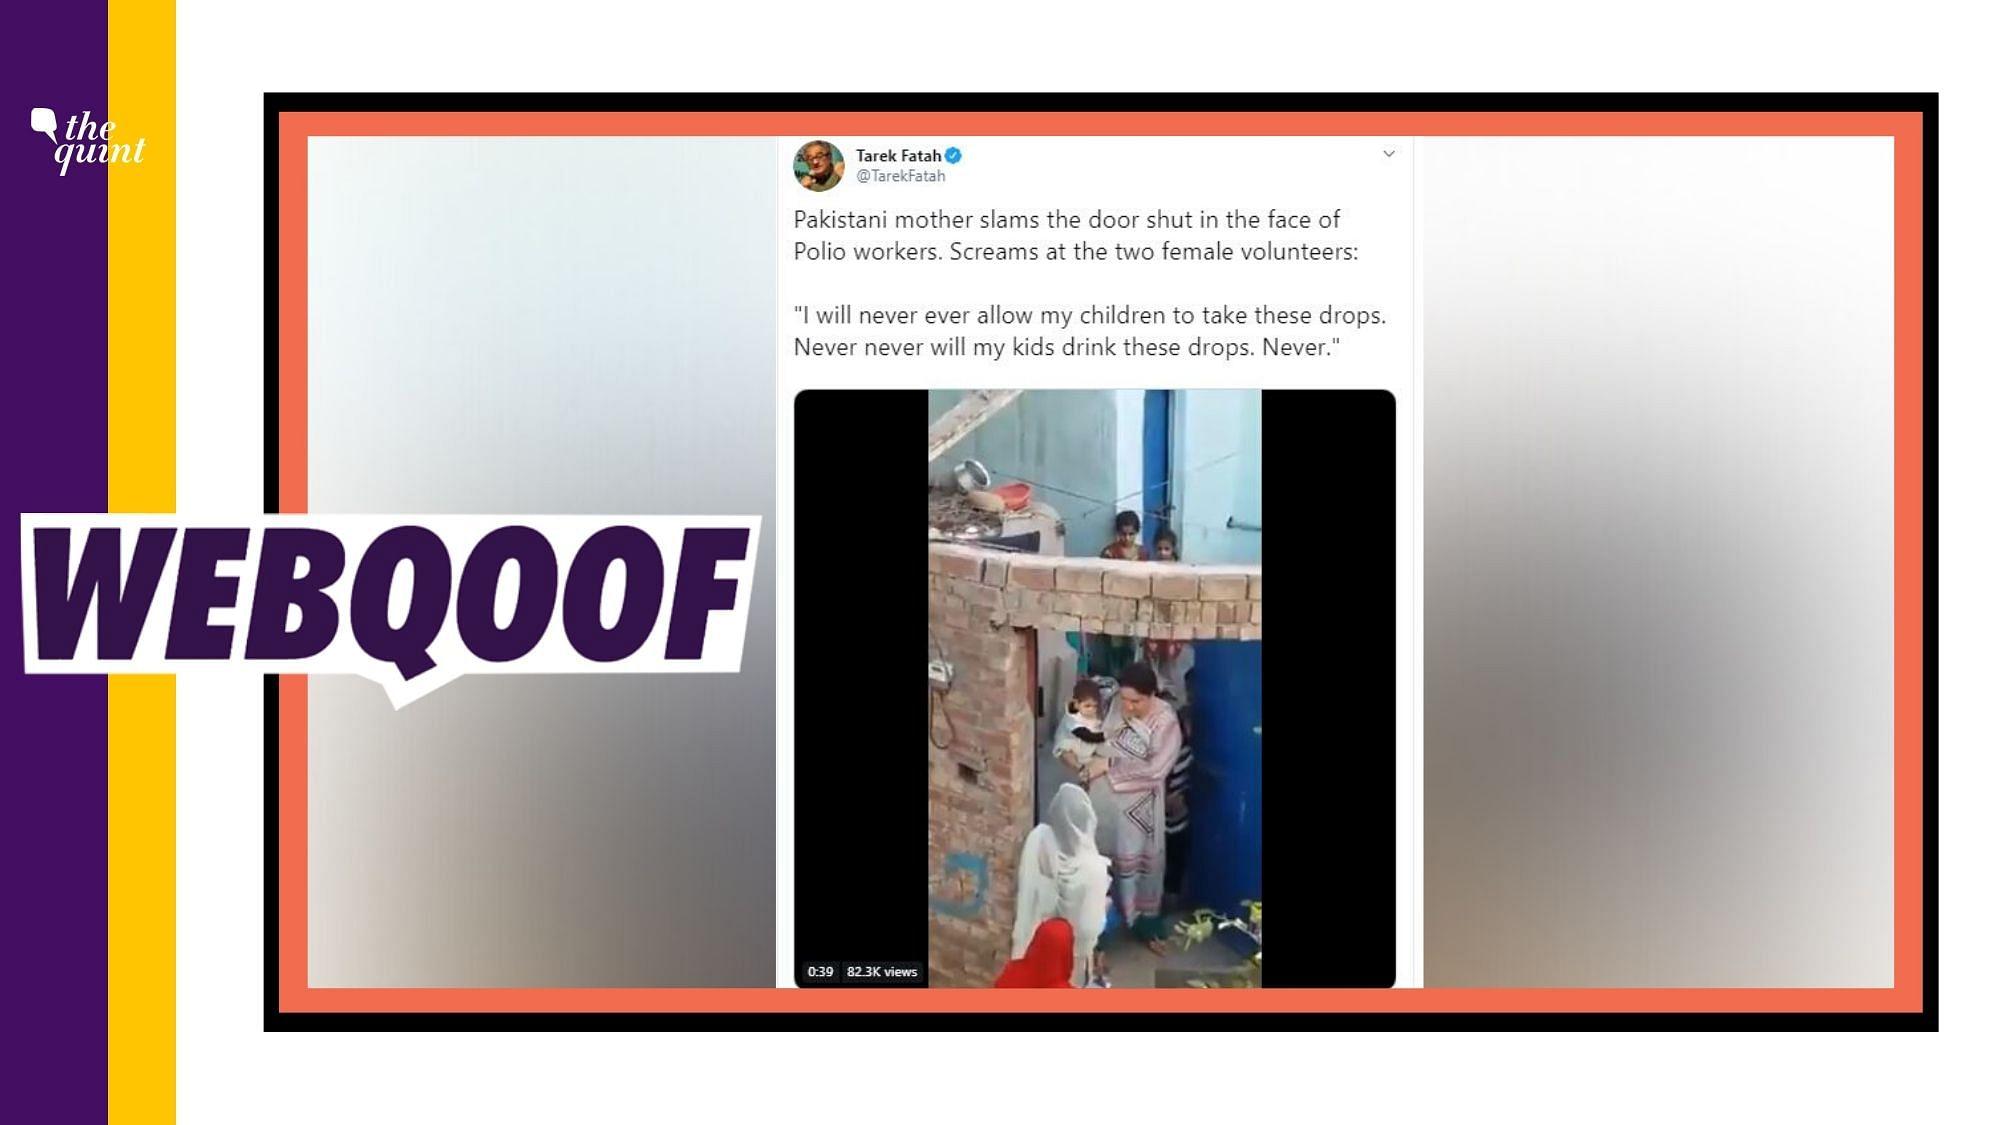 Pak Woman Yelled at Polio Workers? No, Tarek Fatah Gets It Wrong